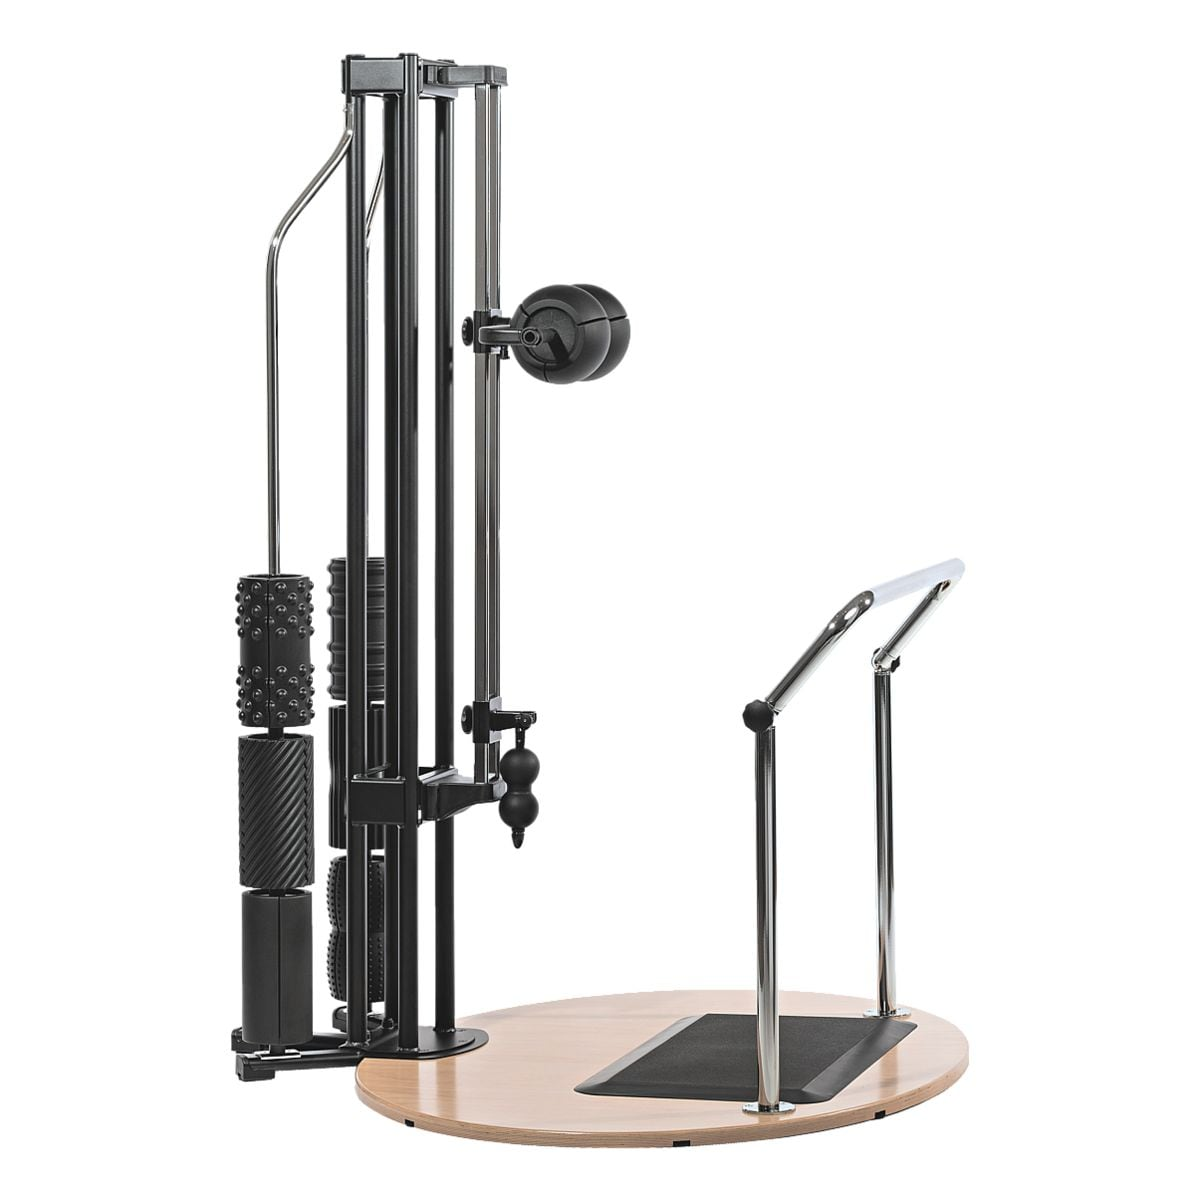 mey CHAIR SYSTEMS GmbH Équipement d'entraînement fascia fitness « ROLLover »